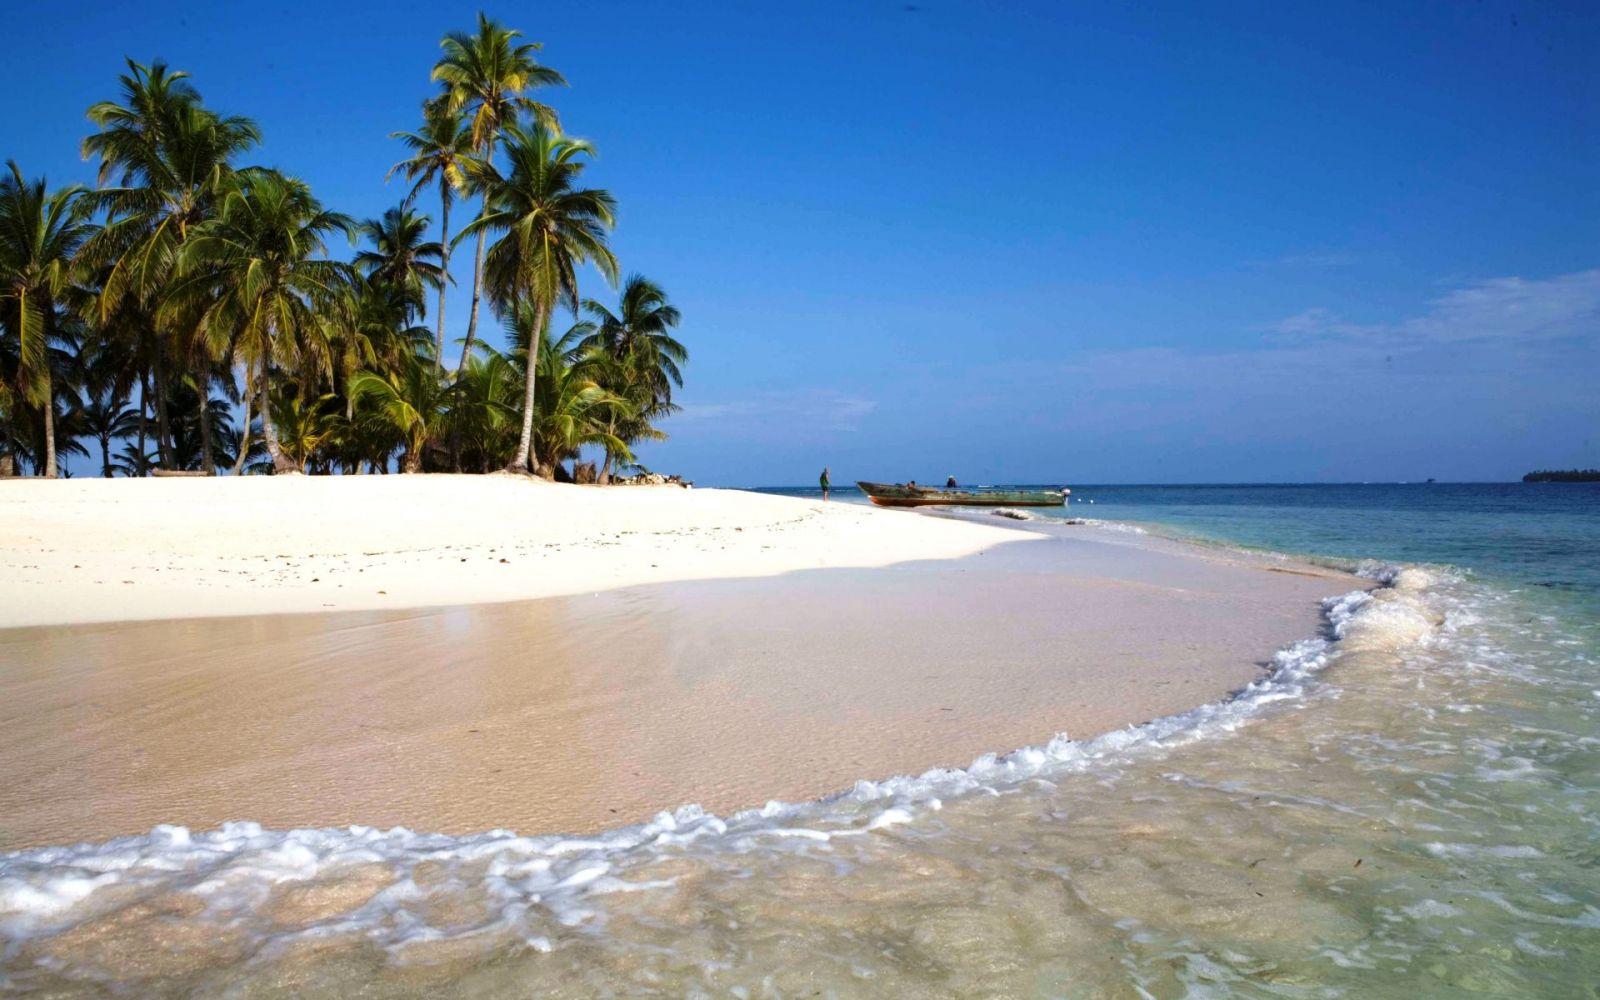 Побережье Панамы